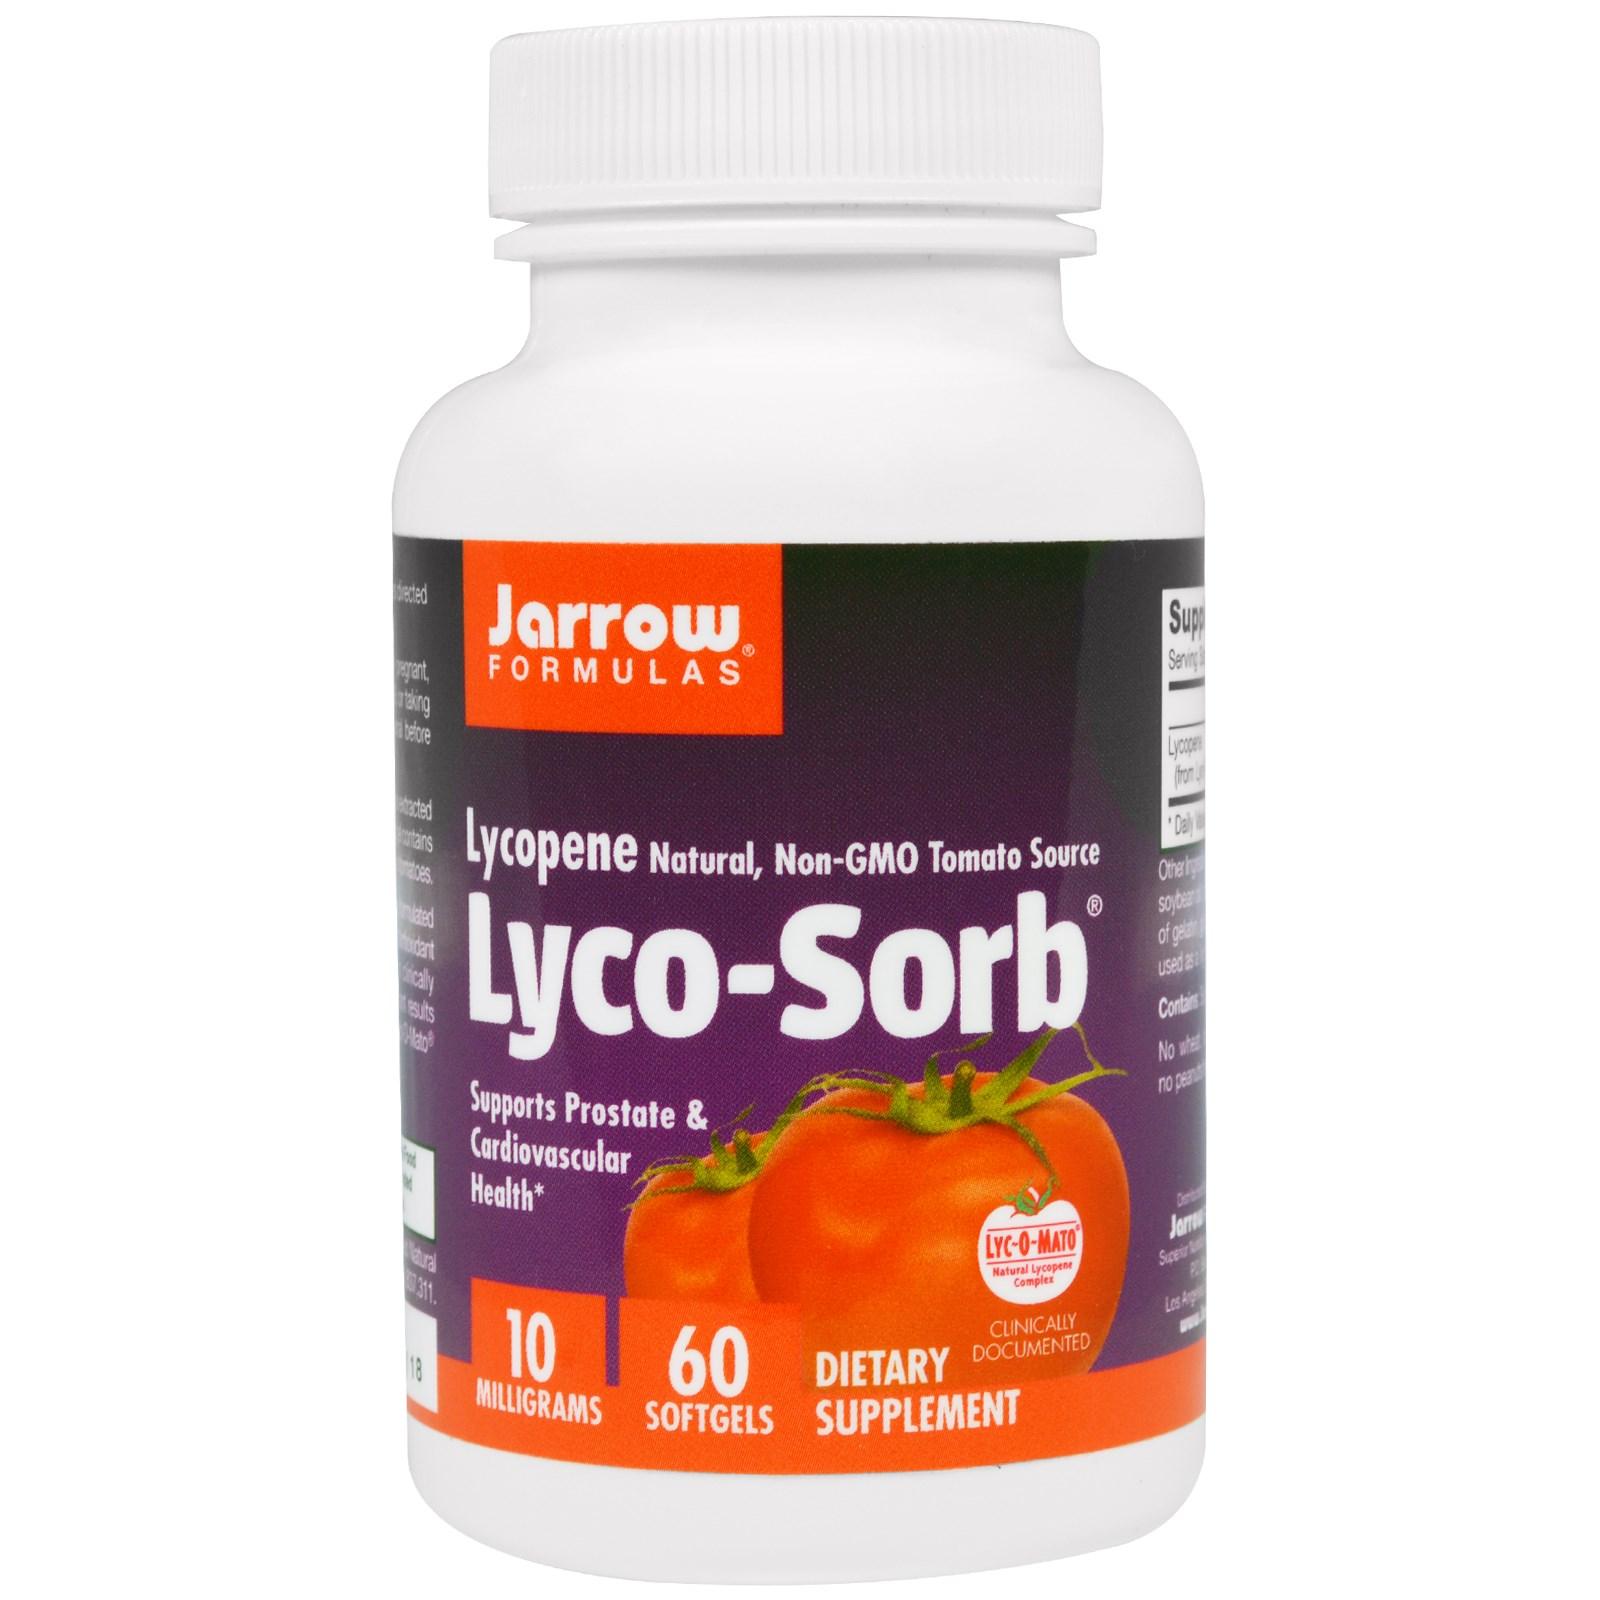 Image of Lyco-Sorb licopene 10 mg (60 capsule) - Jarrow Formulas 0790011120124